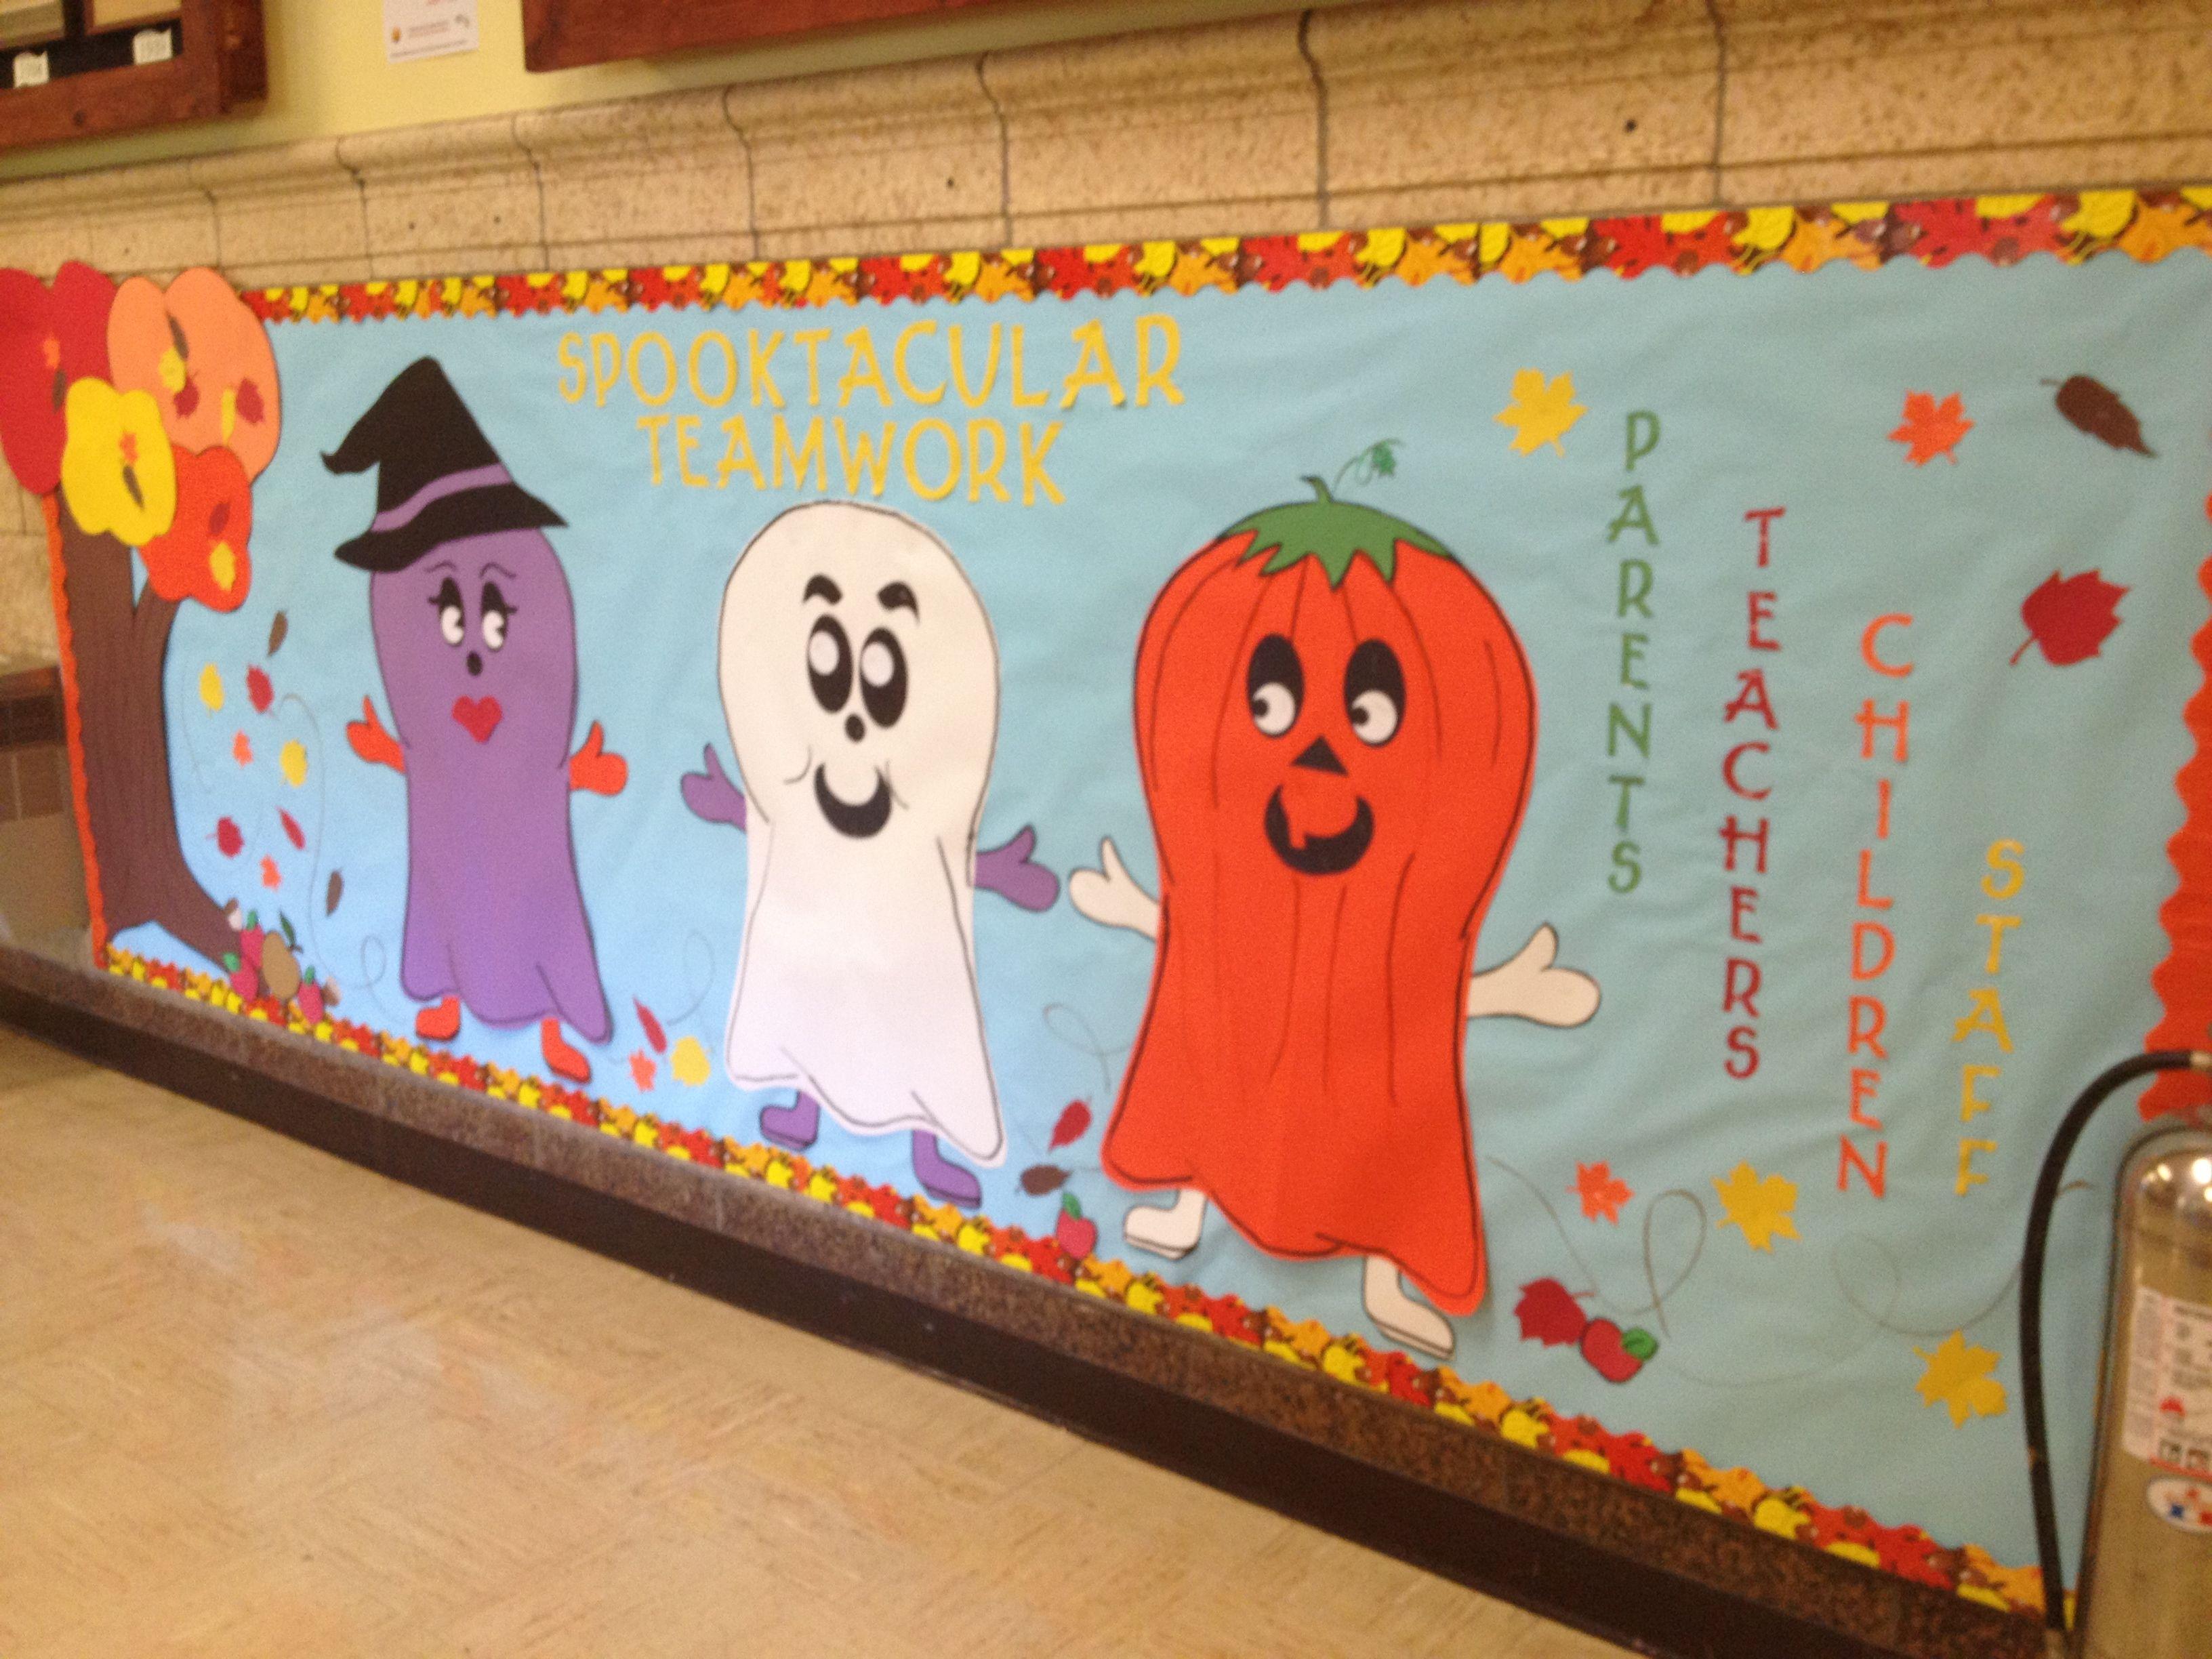 Bulletin Board Themes For Elementary School Hallways - Pin It